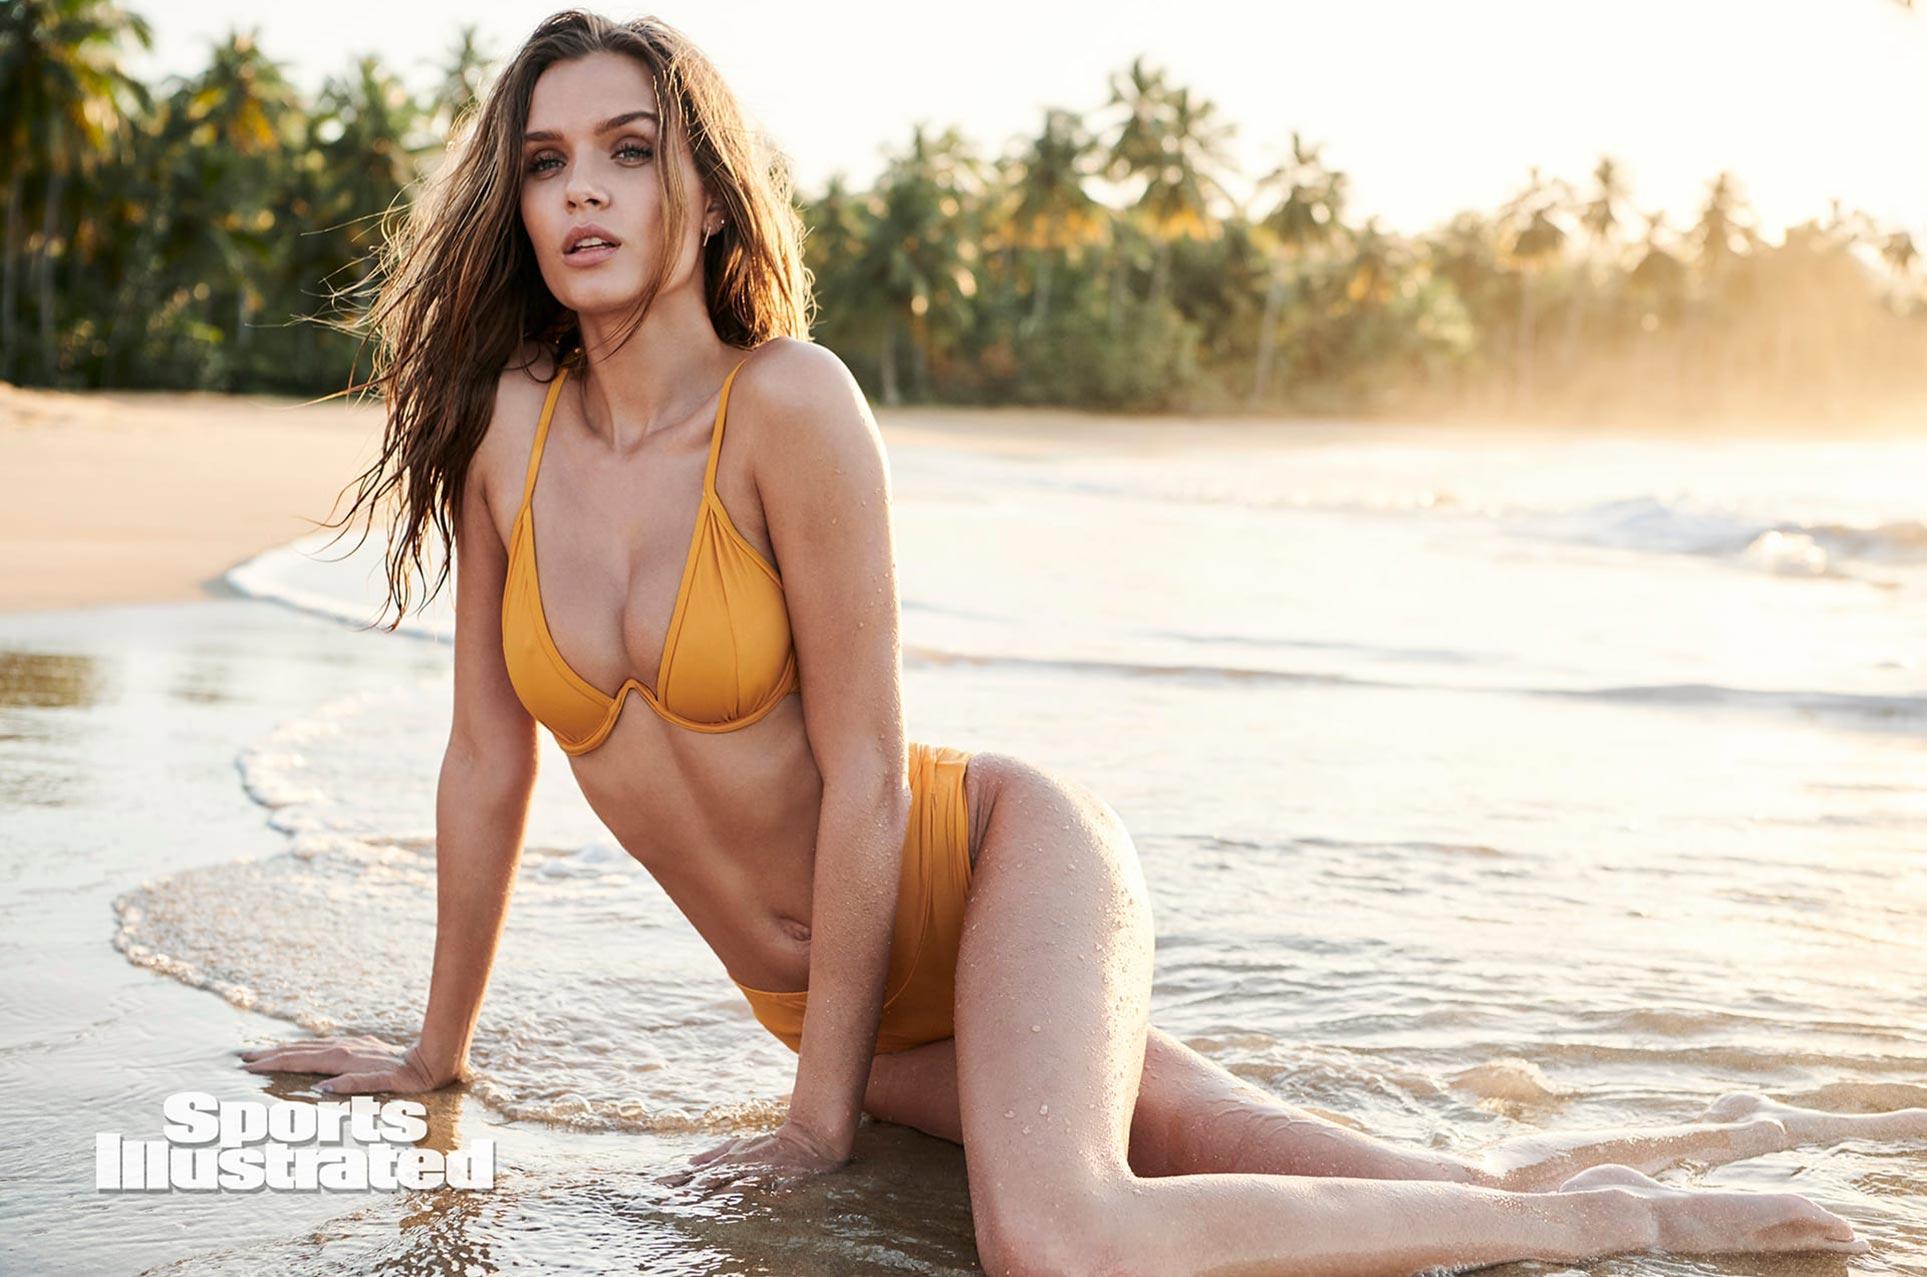 Жозефин Скривер в каталоге купальников Sports Illustrated Swimsuit 2020 / фото 22